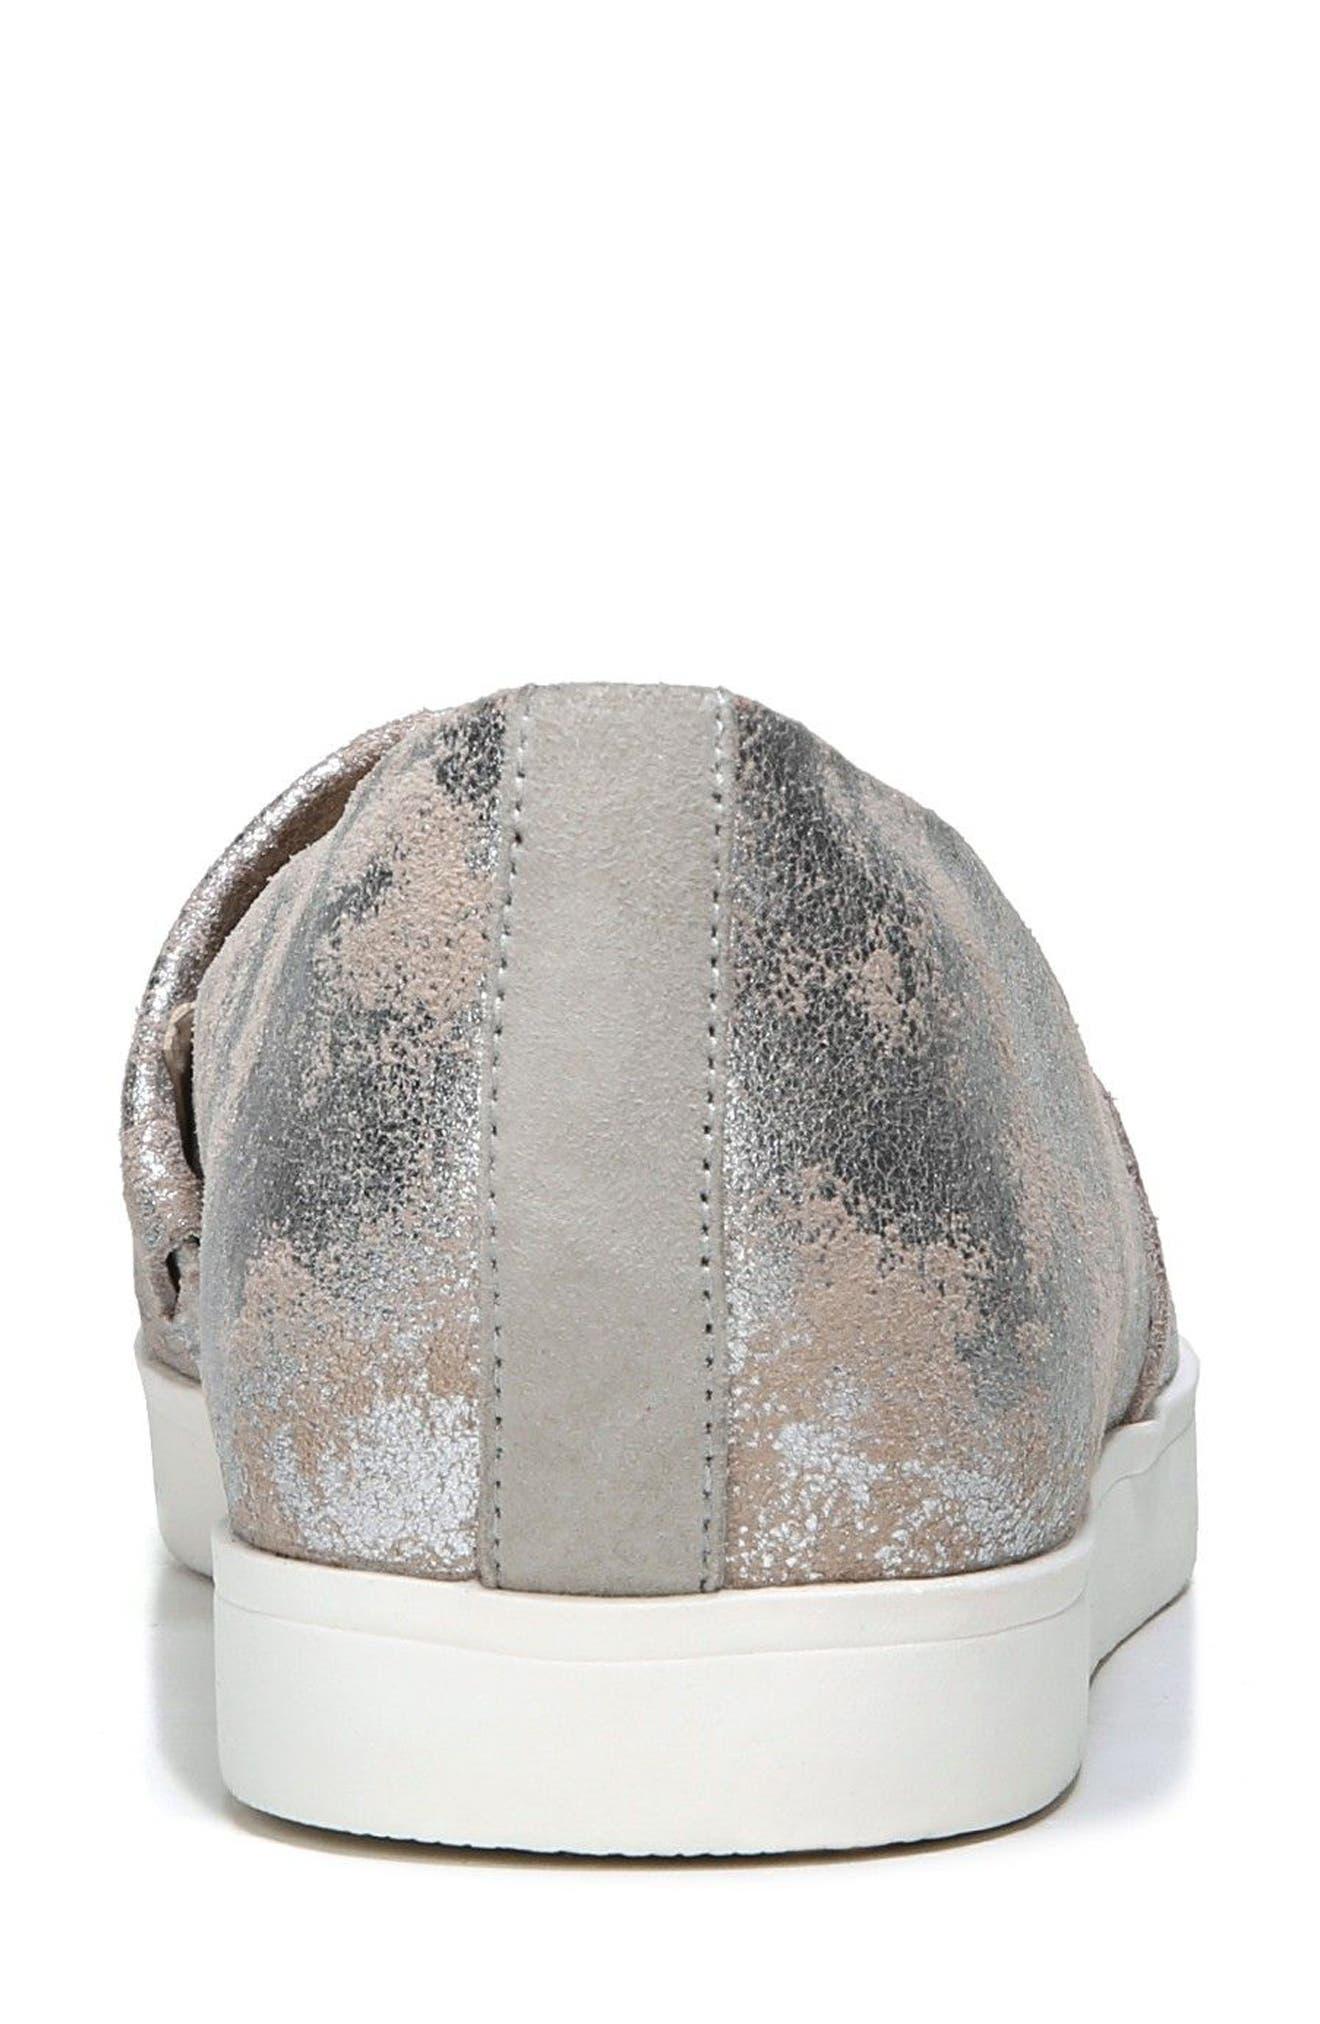 'Vienna' Slip-on Sneaker,                             Alternate thumbnail 7, color,                             040